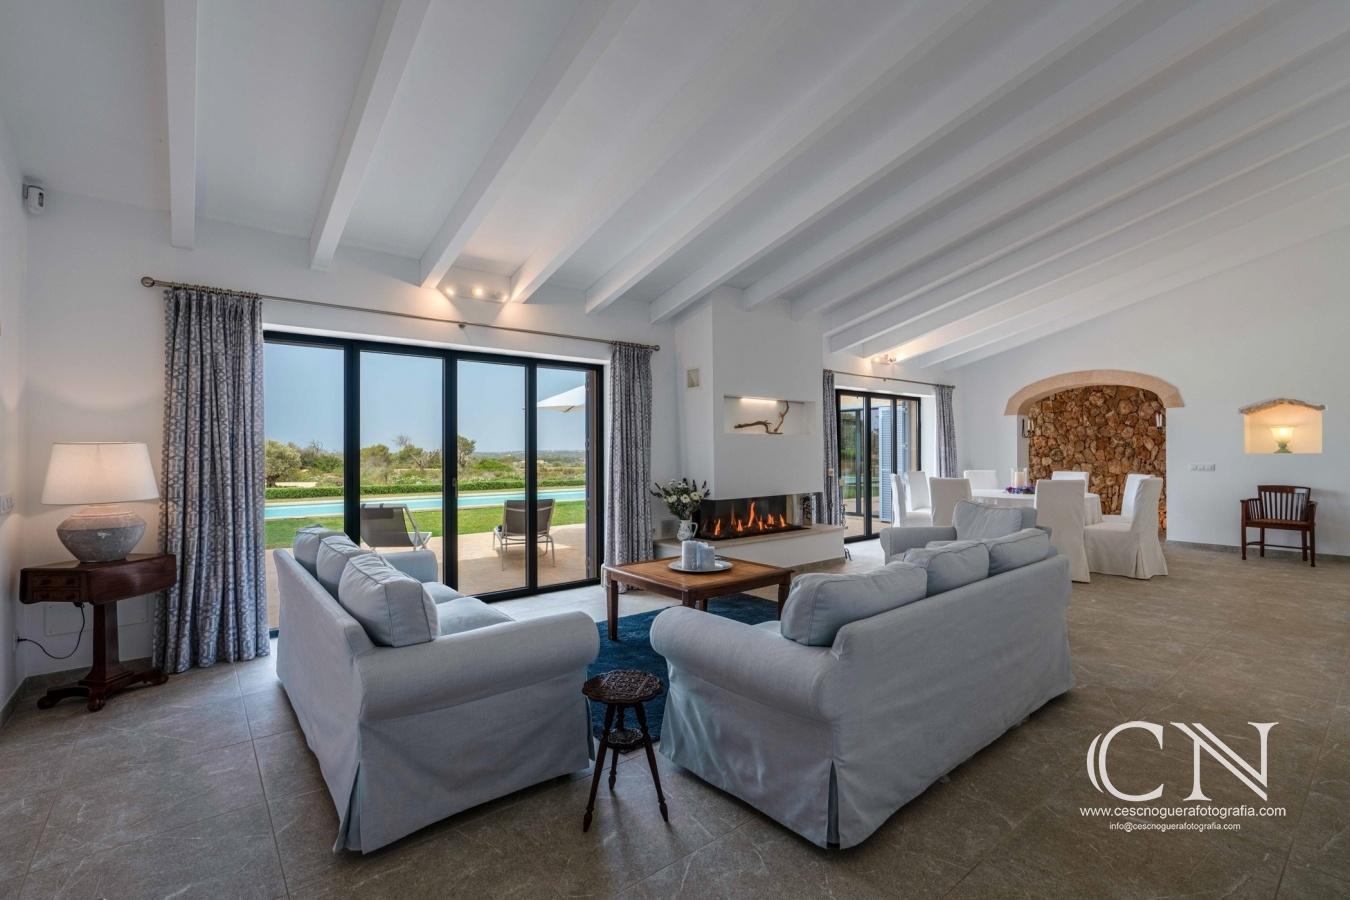 Real Estate  - Cesc Noguera Fotografia, Architectural & Interior design photographer / Landscape Photography